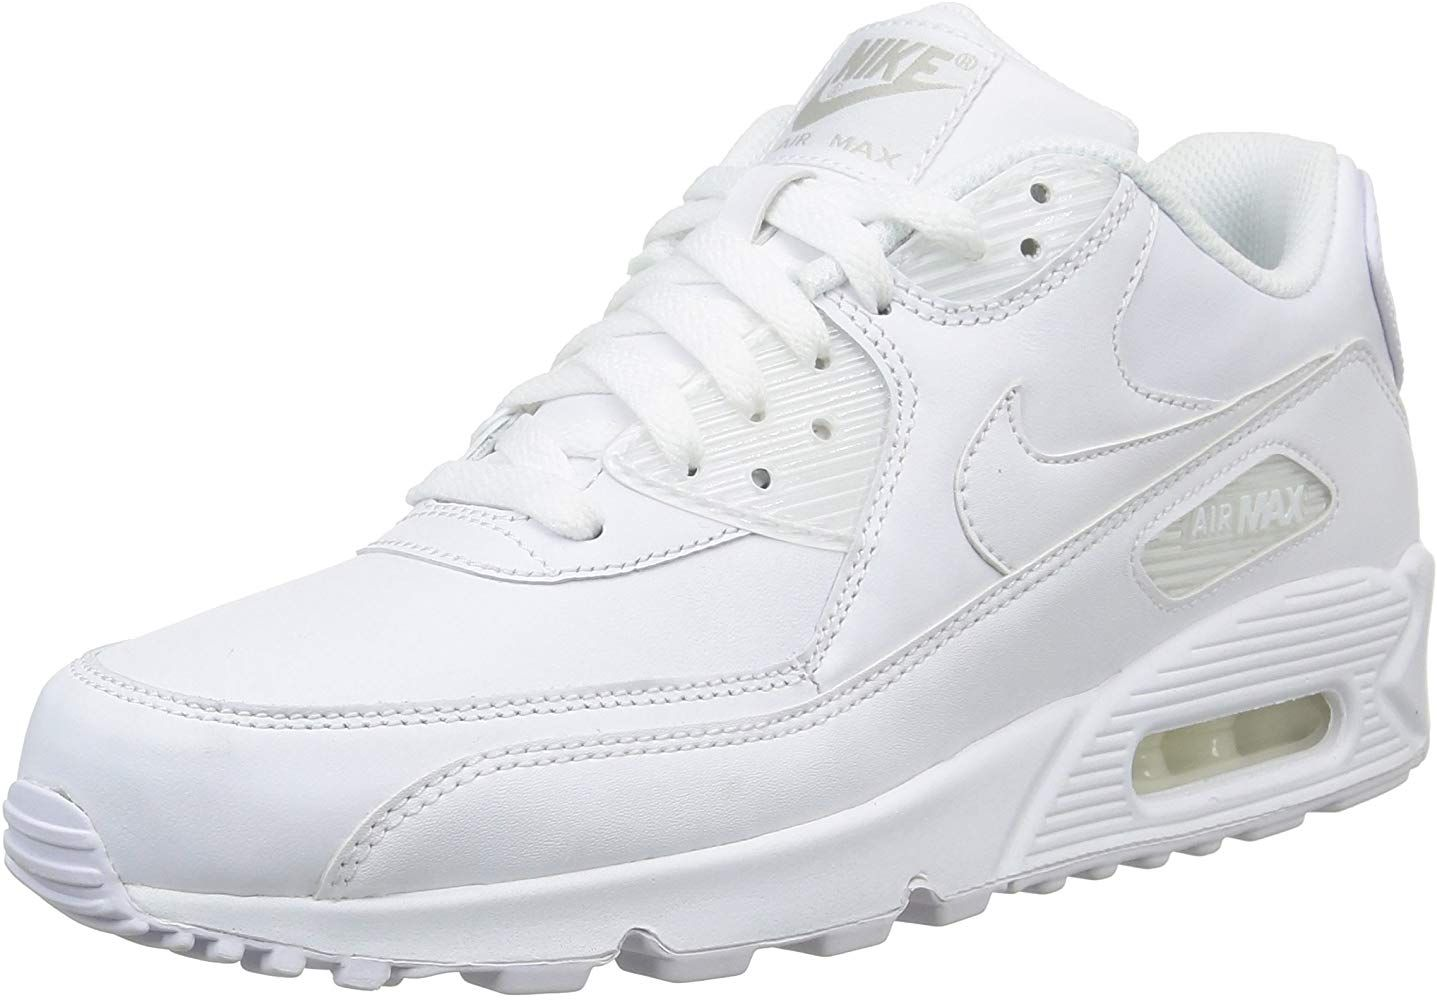 Nike Air Max 90 Leather Herren Sneakers Weiss White White 41 Eu Nike Schuhe Turnschuhe Nike Nike Manner